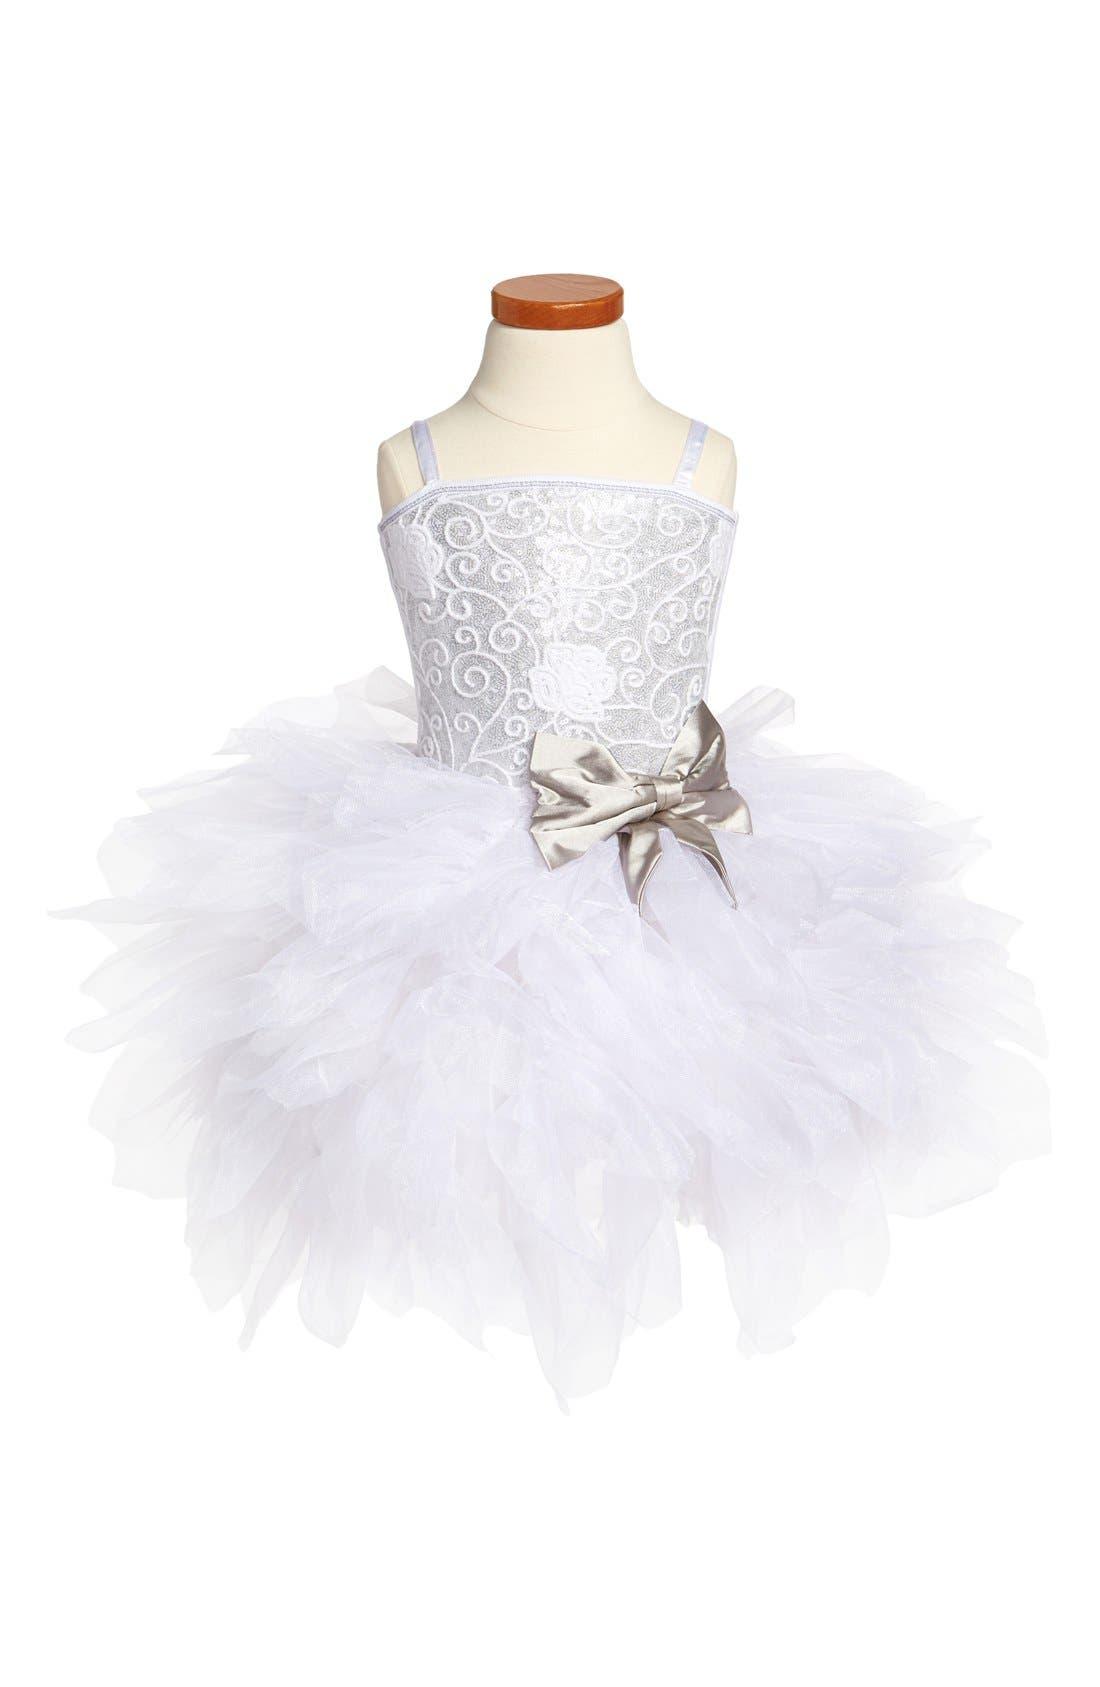 Main Image - Ooh! La, La! Couture 'Emma' Dress (Little Girls & Big Girls)